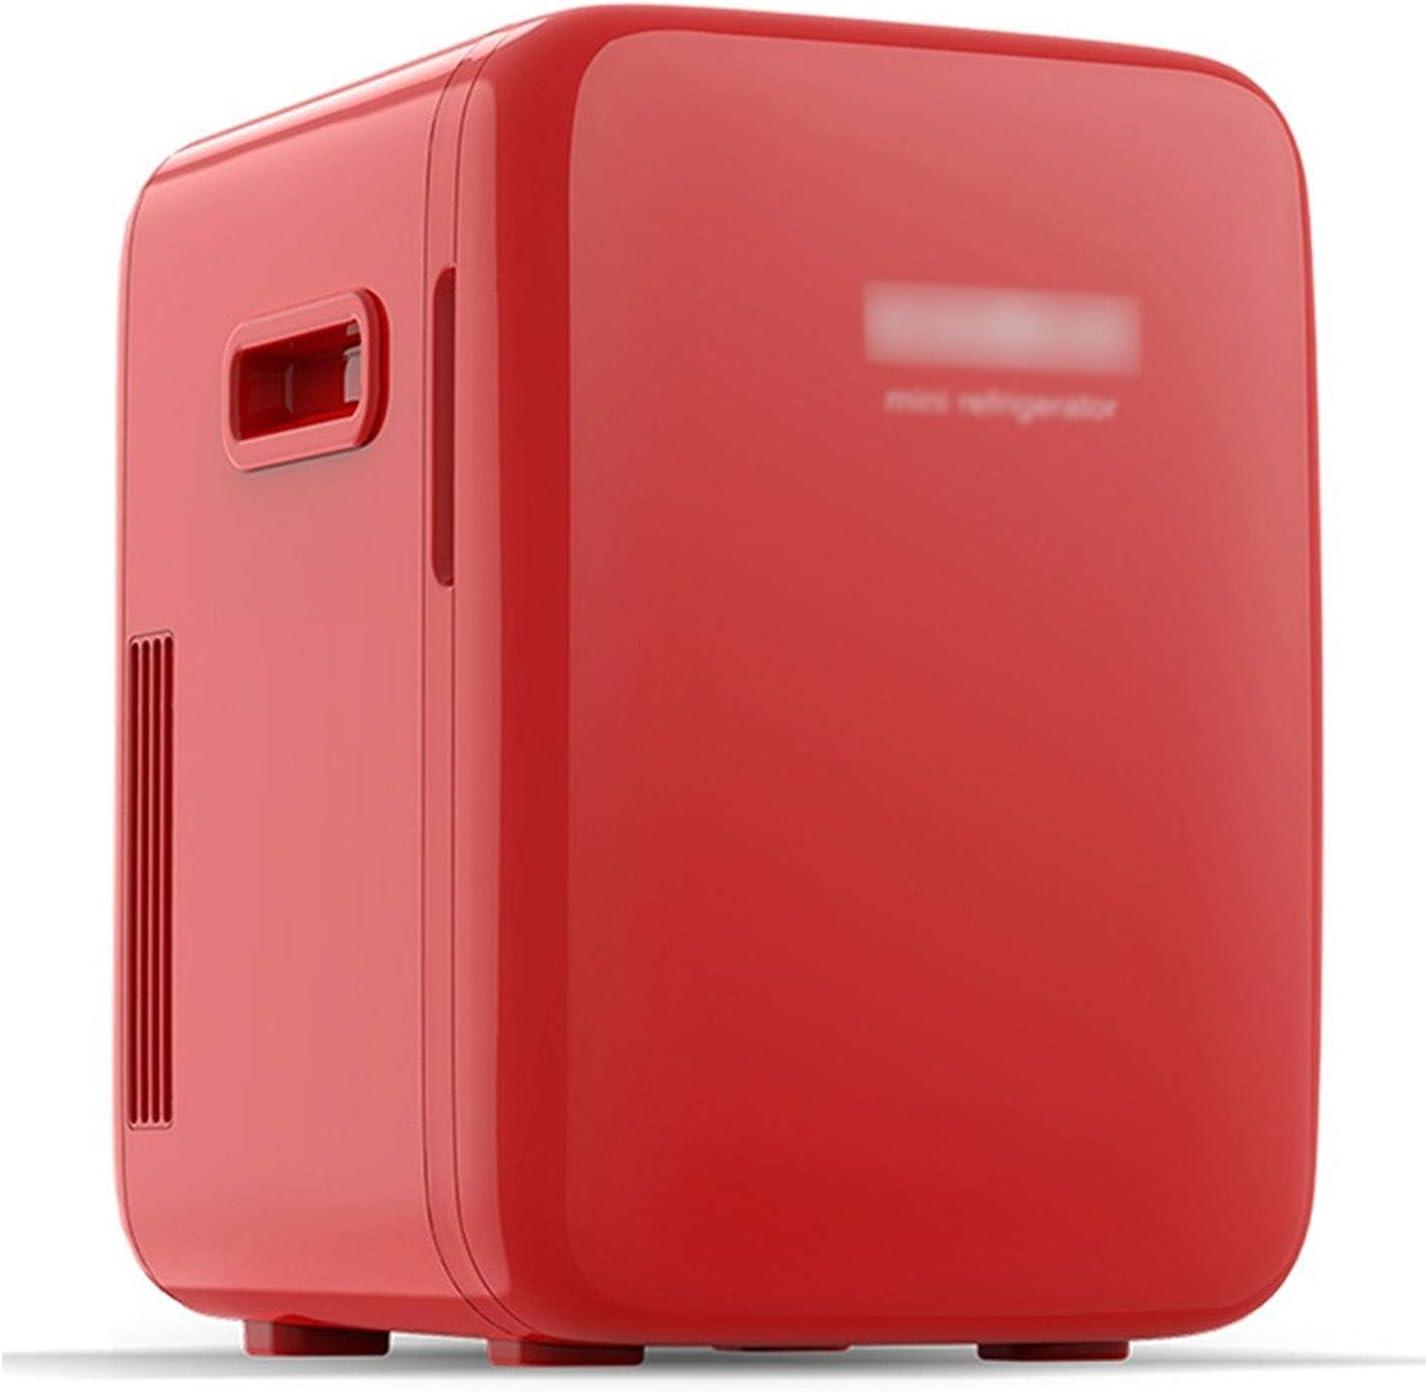 LQX Mini Fridge online shop Cooler Warmer 10L Portable Car Refrigerator Mute Sale